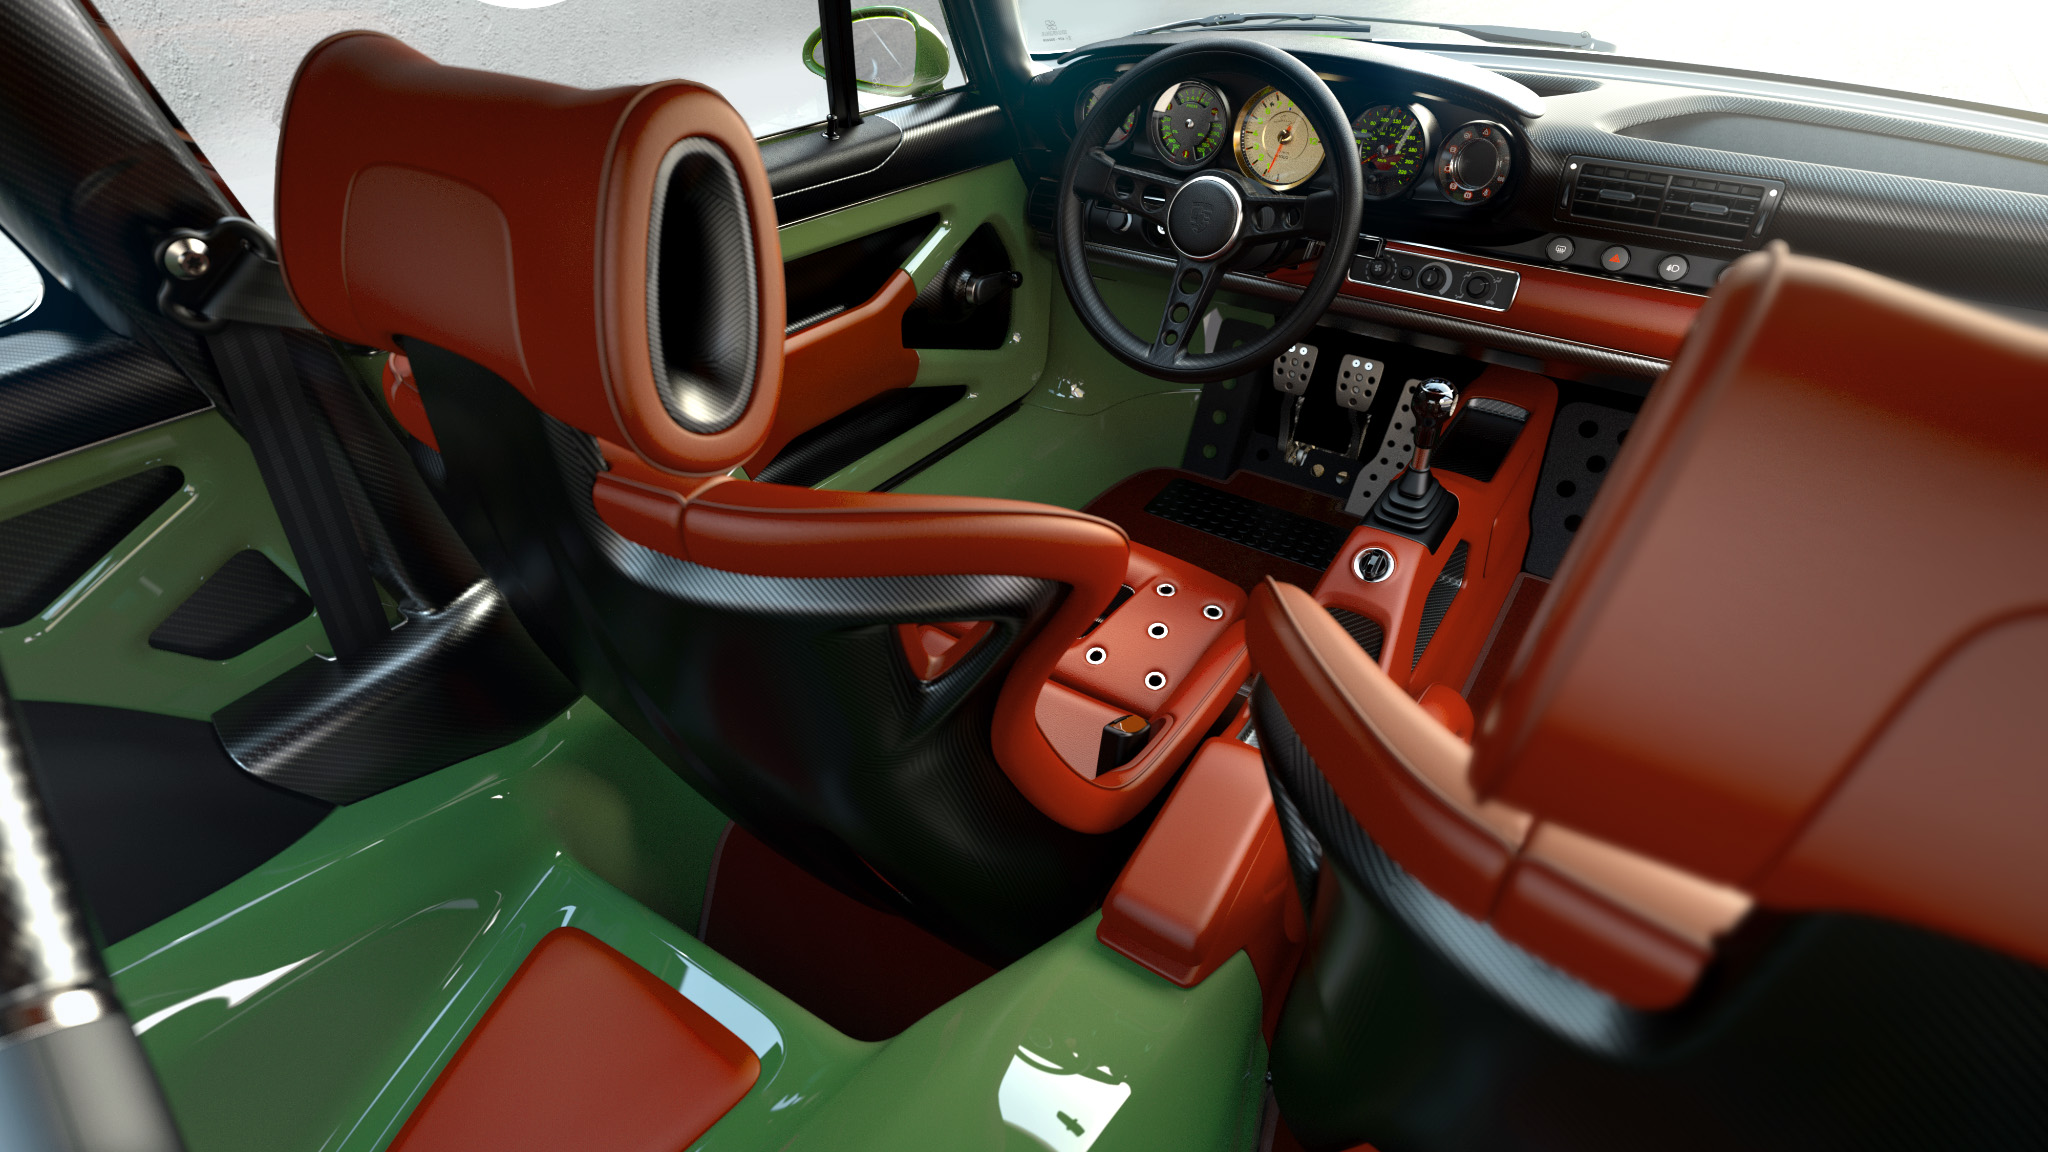 1990 Porsche 911 interior looking forwards